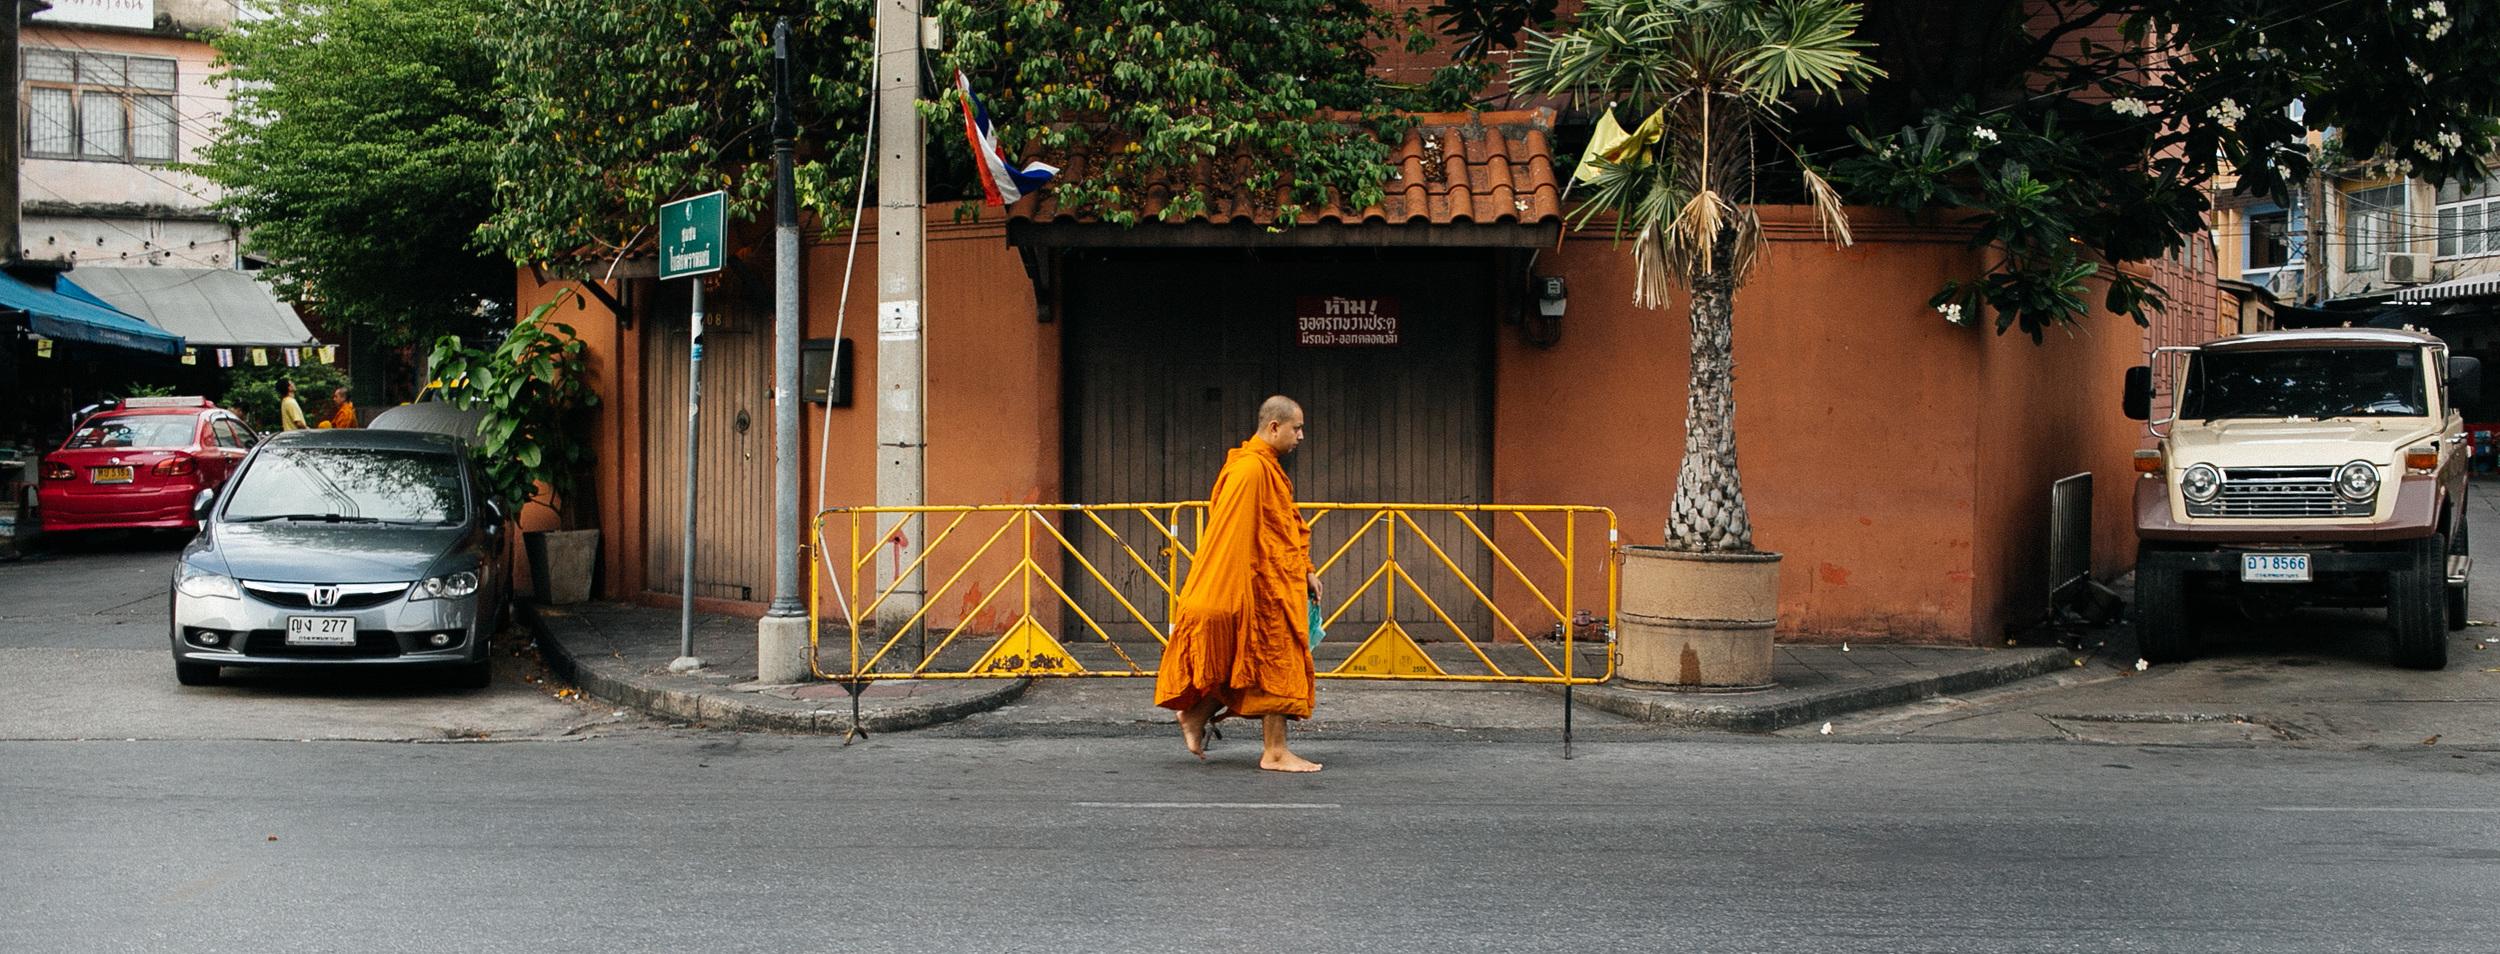 Bangkok+389A9973.jpg